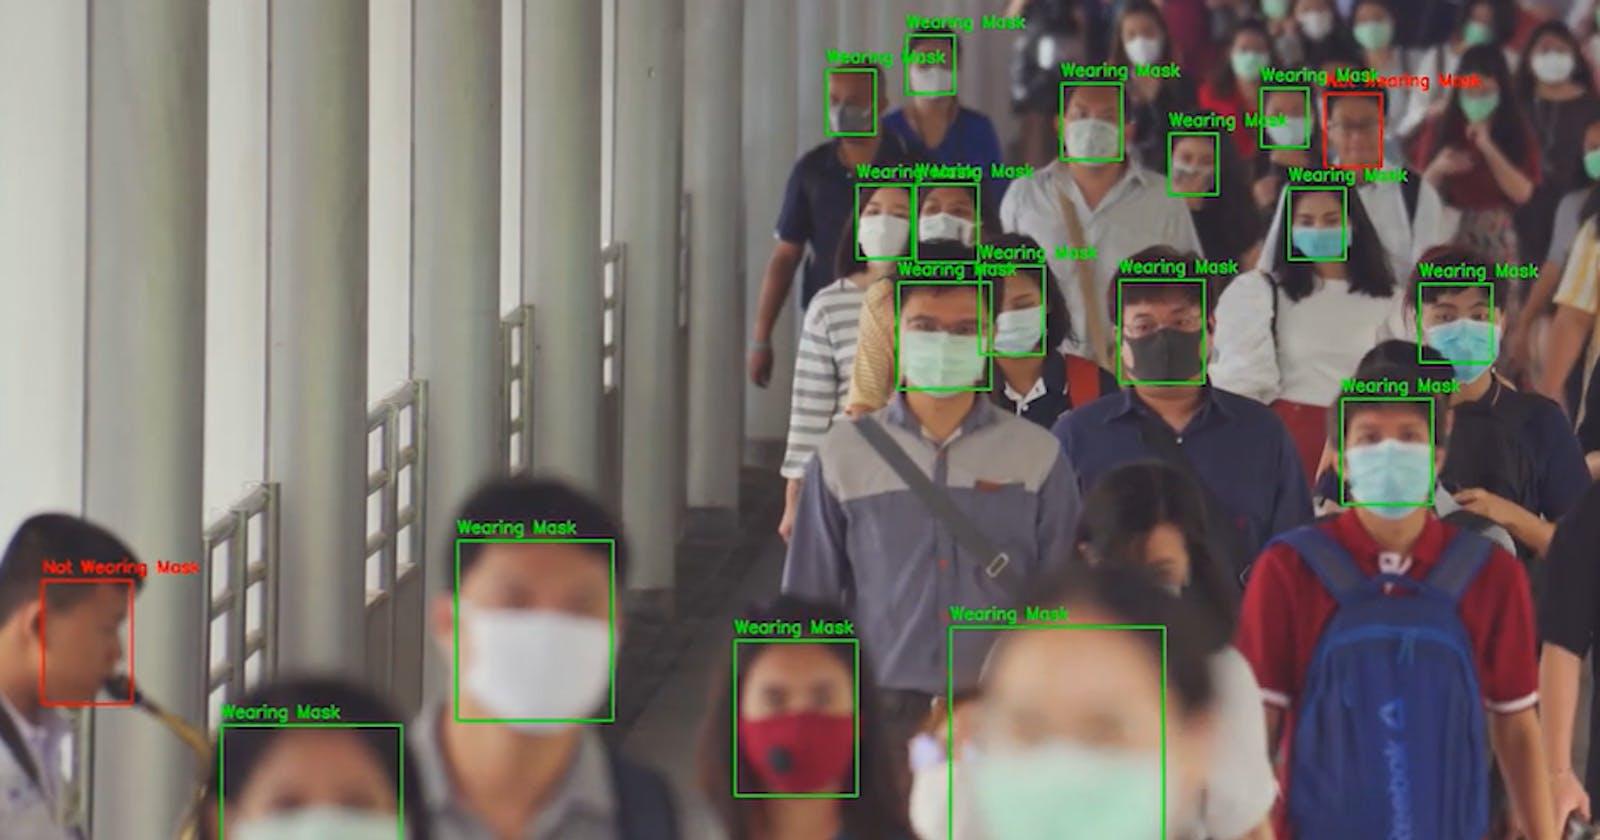 Face Mask Detection using Open CV